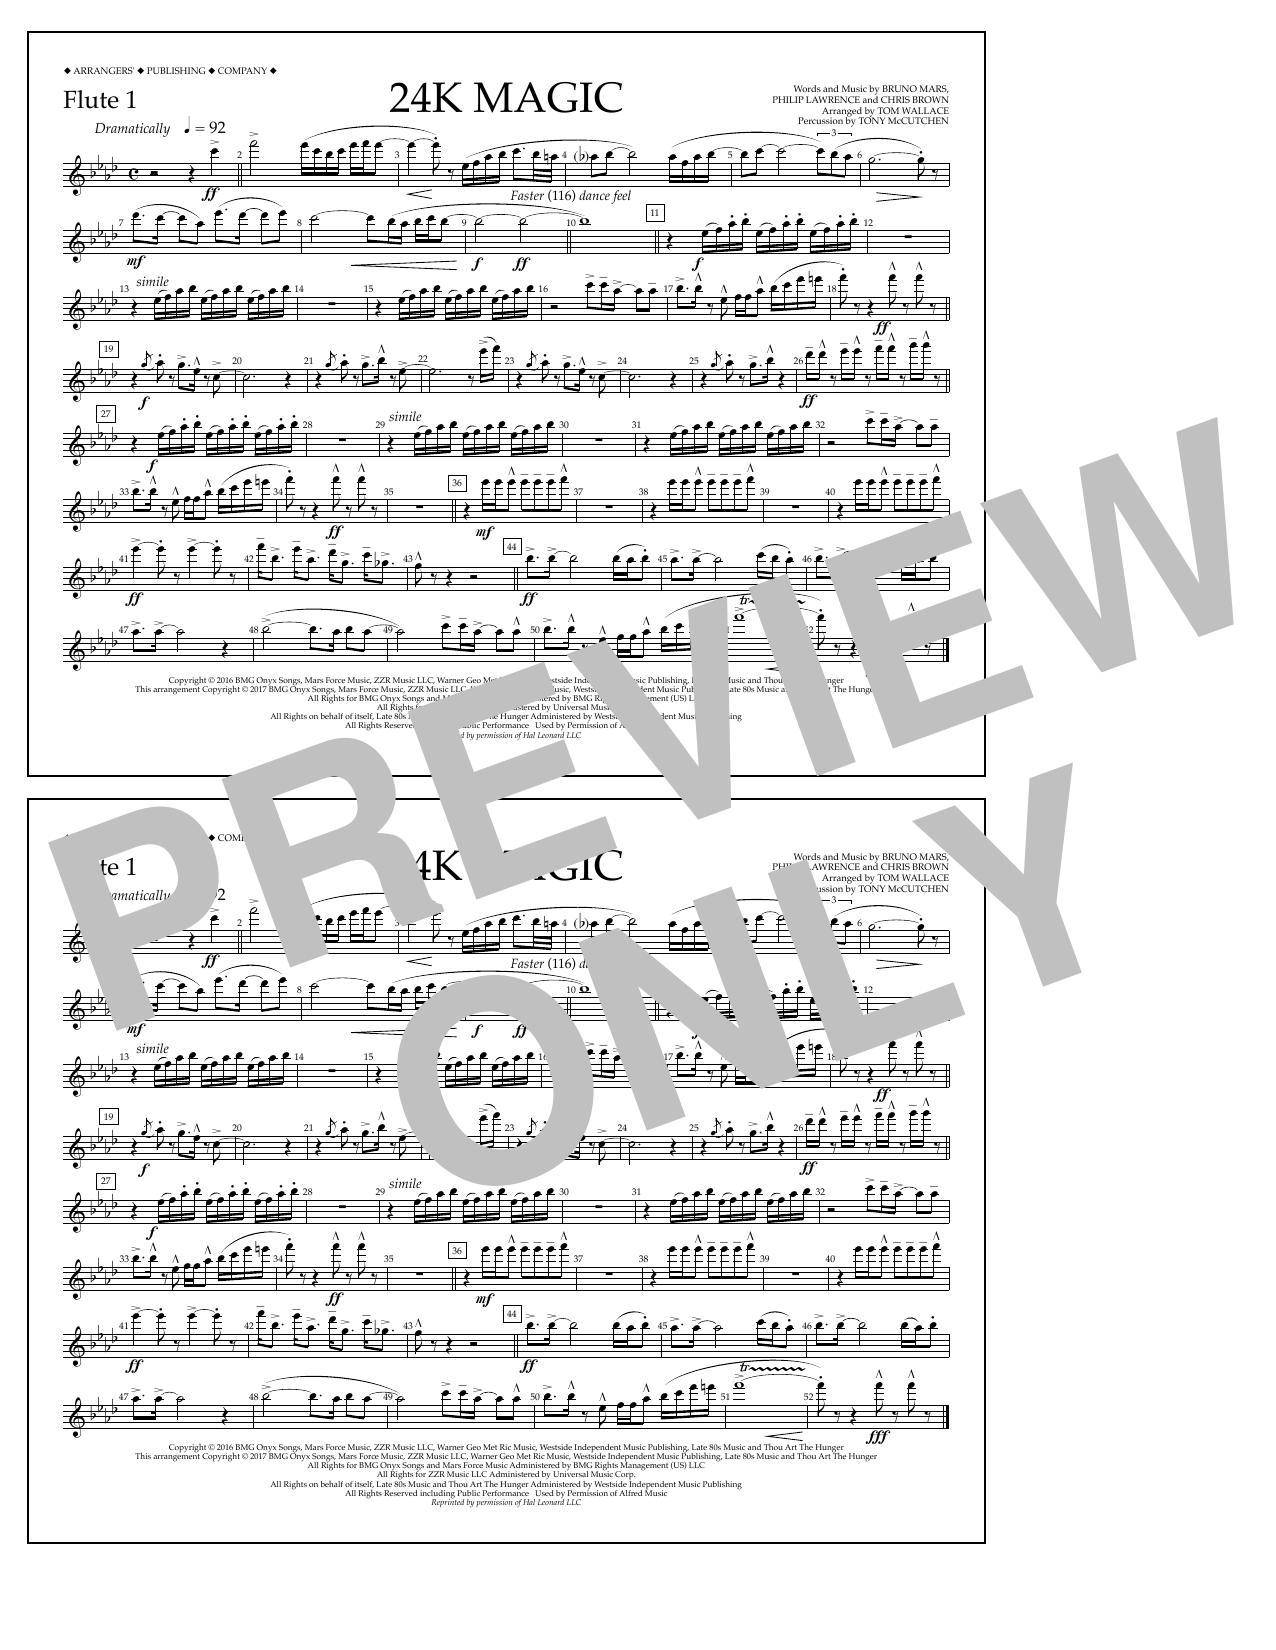 24K Magic - Flute 1 Sheet Music